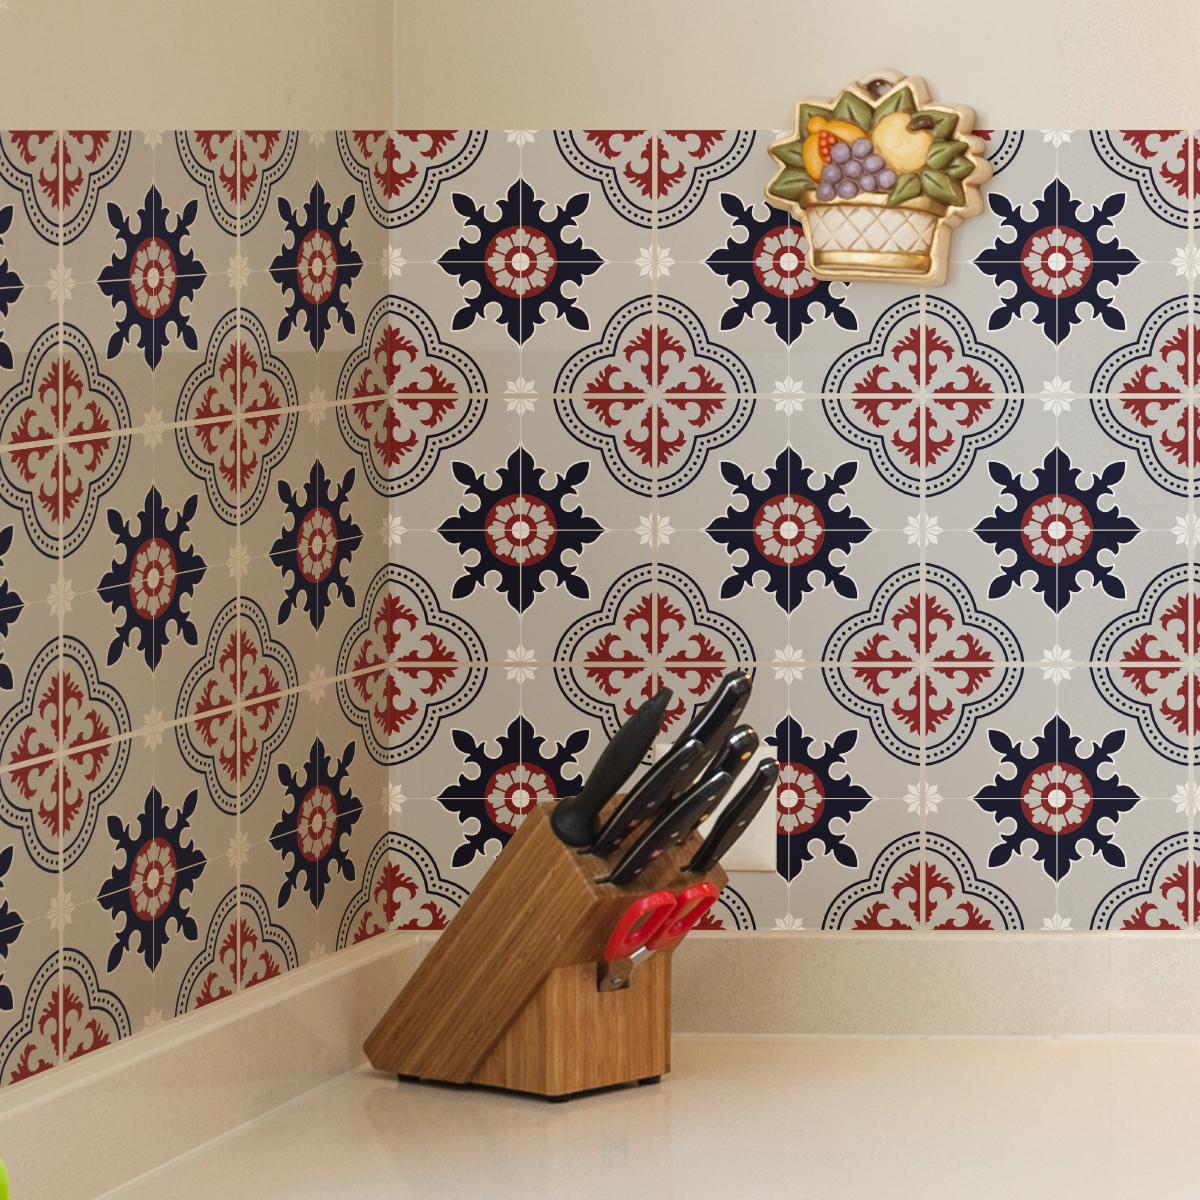 9 stickers carreaux de ciment azulejos admeta cuisine. Black Bedroom Furniture Sets. Home Design Ideas